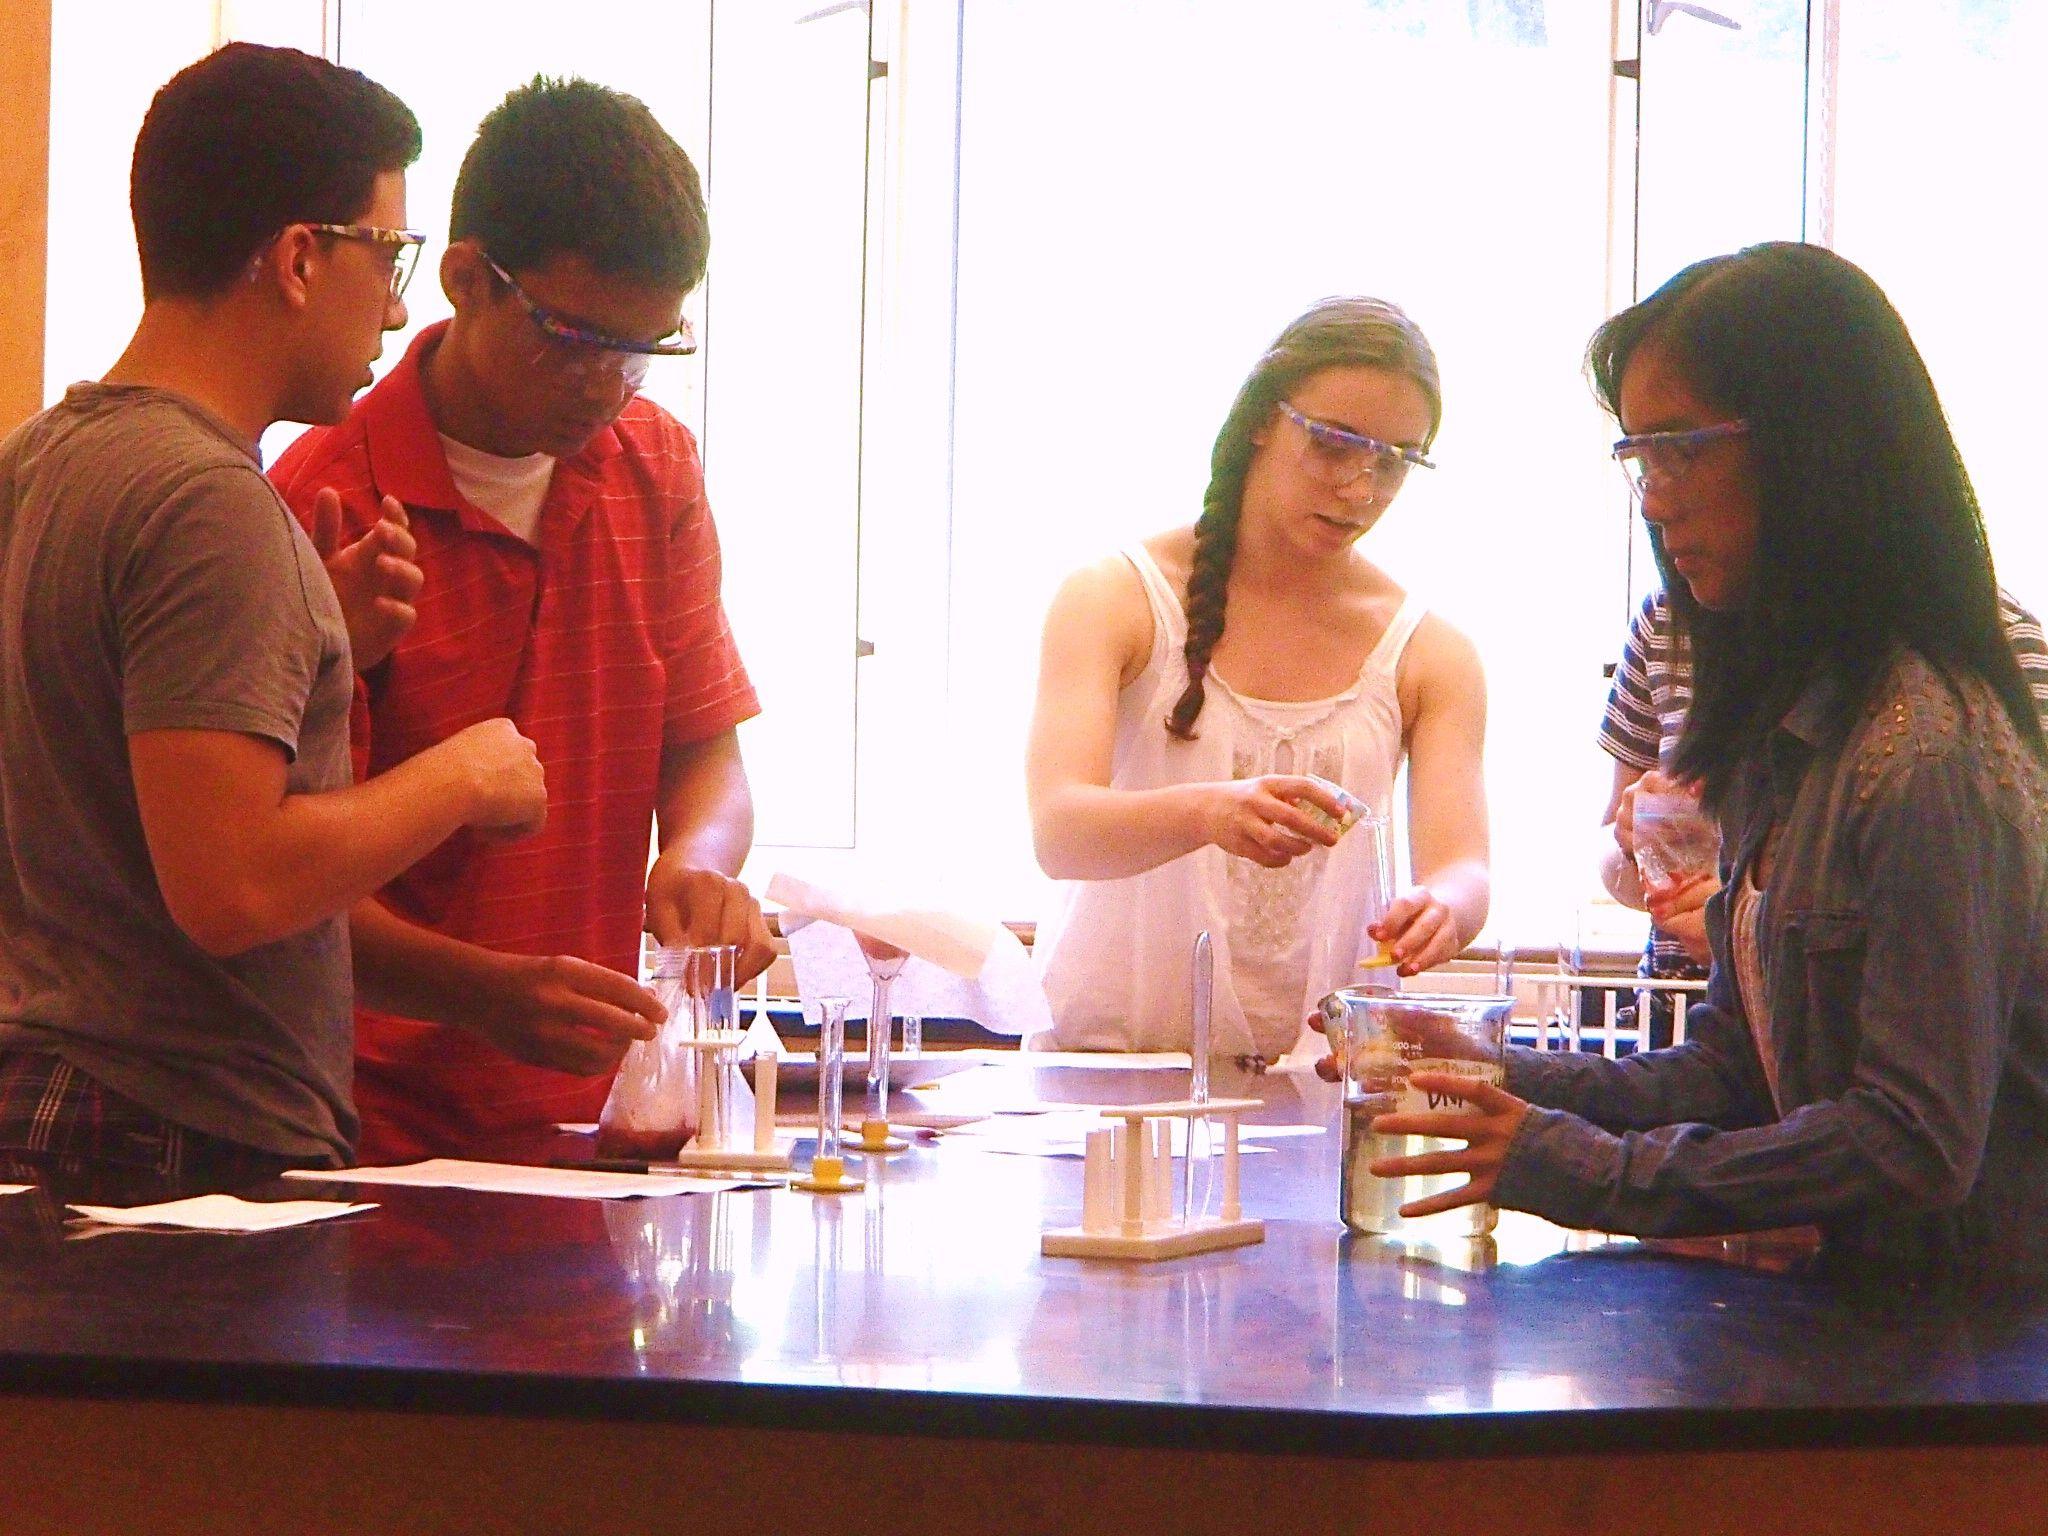 Boston Leadership Institute: Online STEM Programs